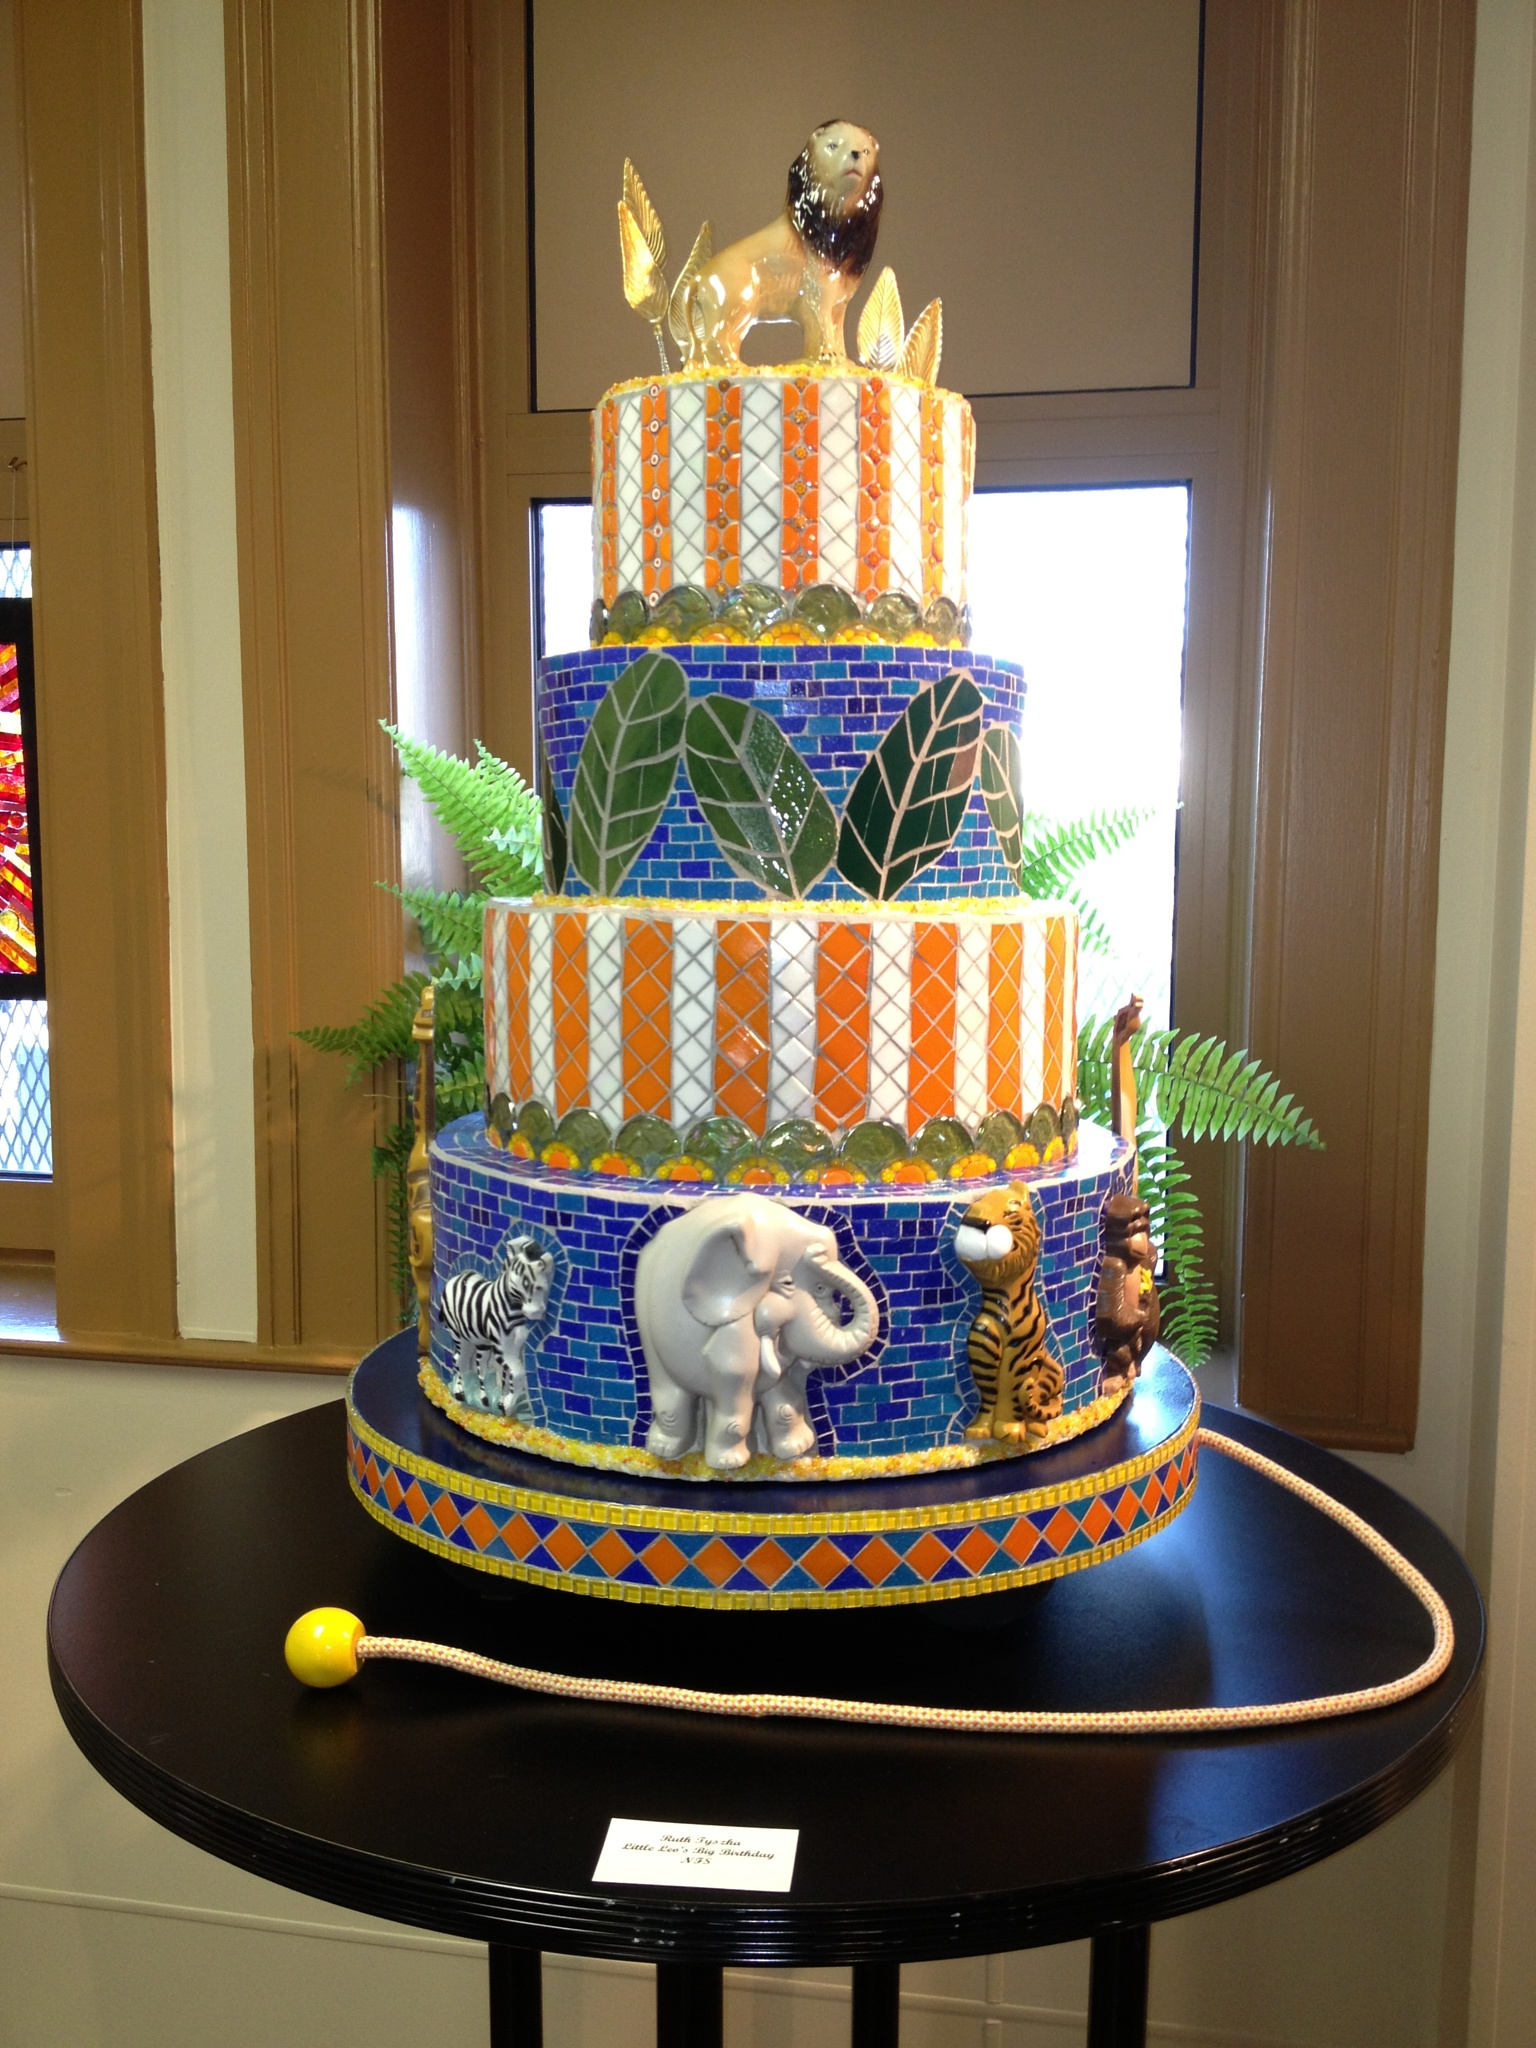 Mosaic Cake by Laurie Ann Morche'